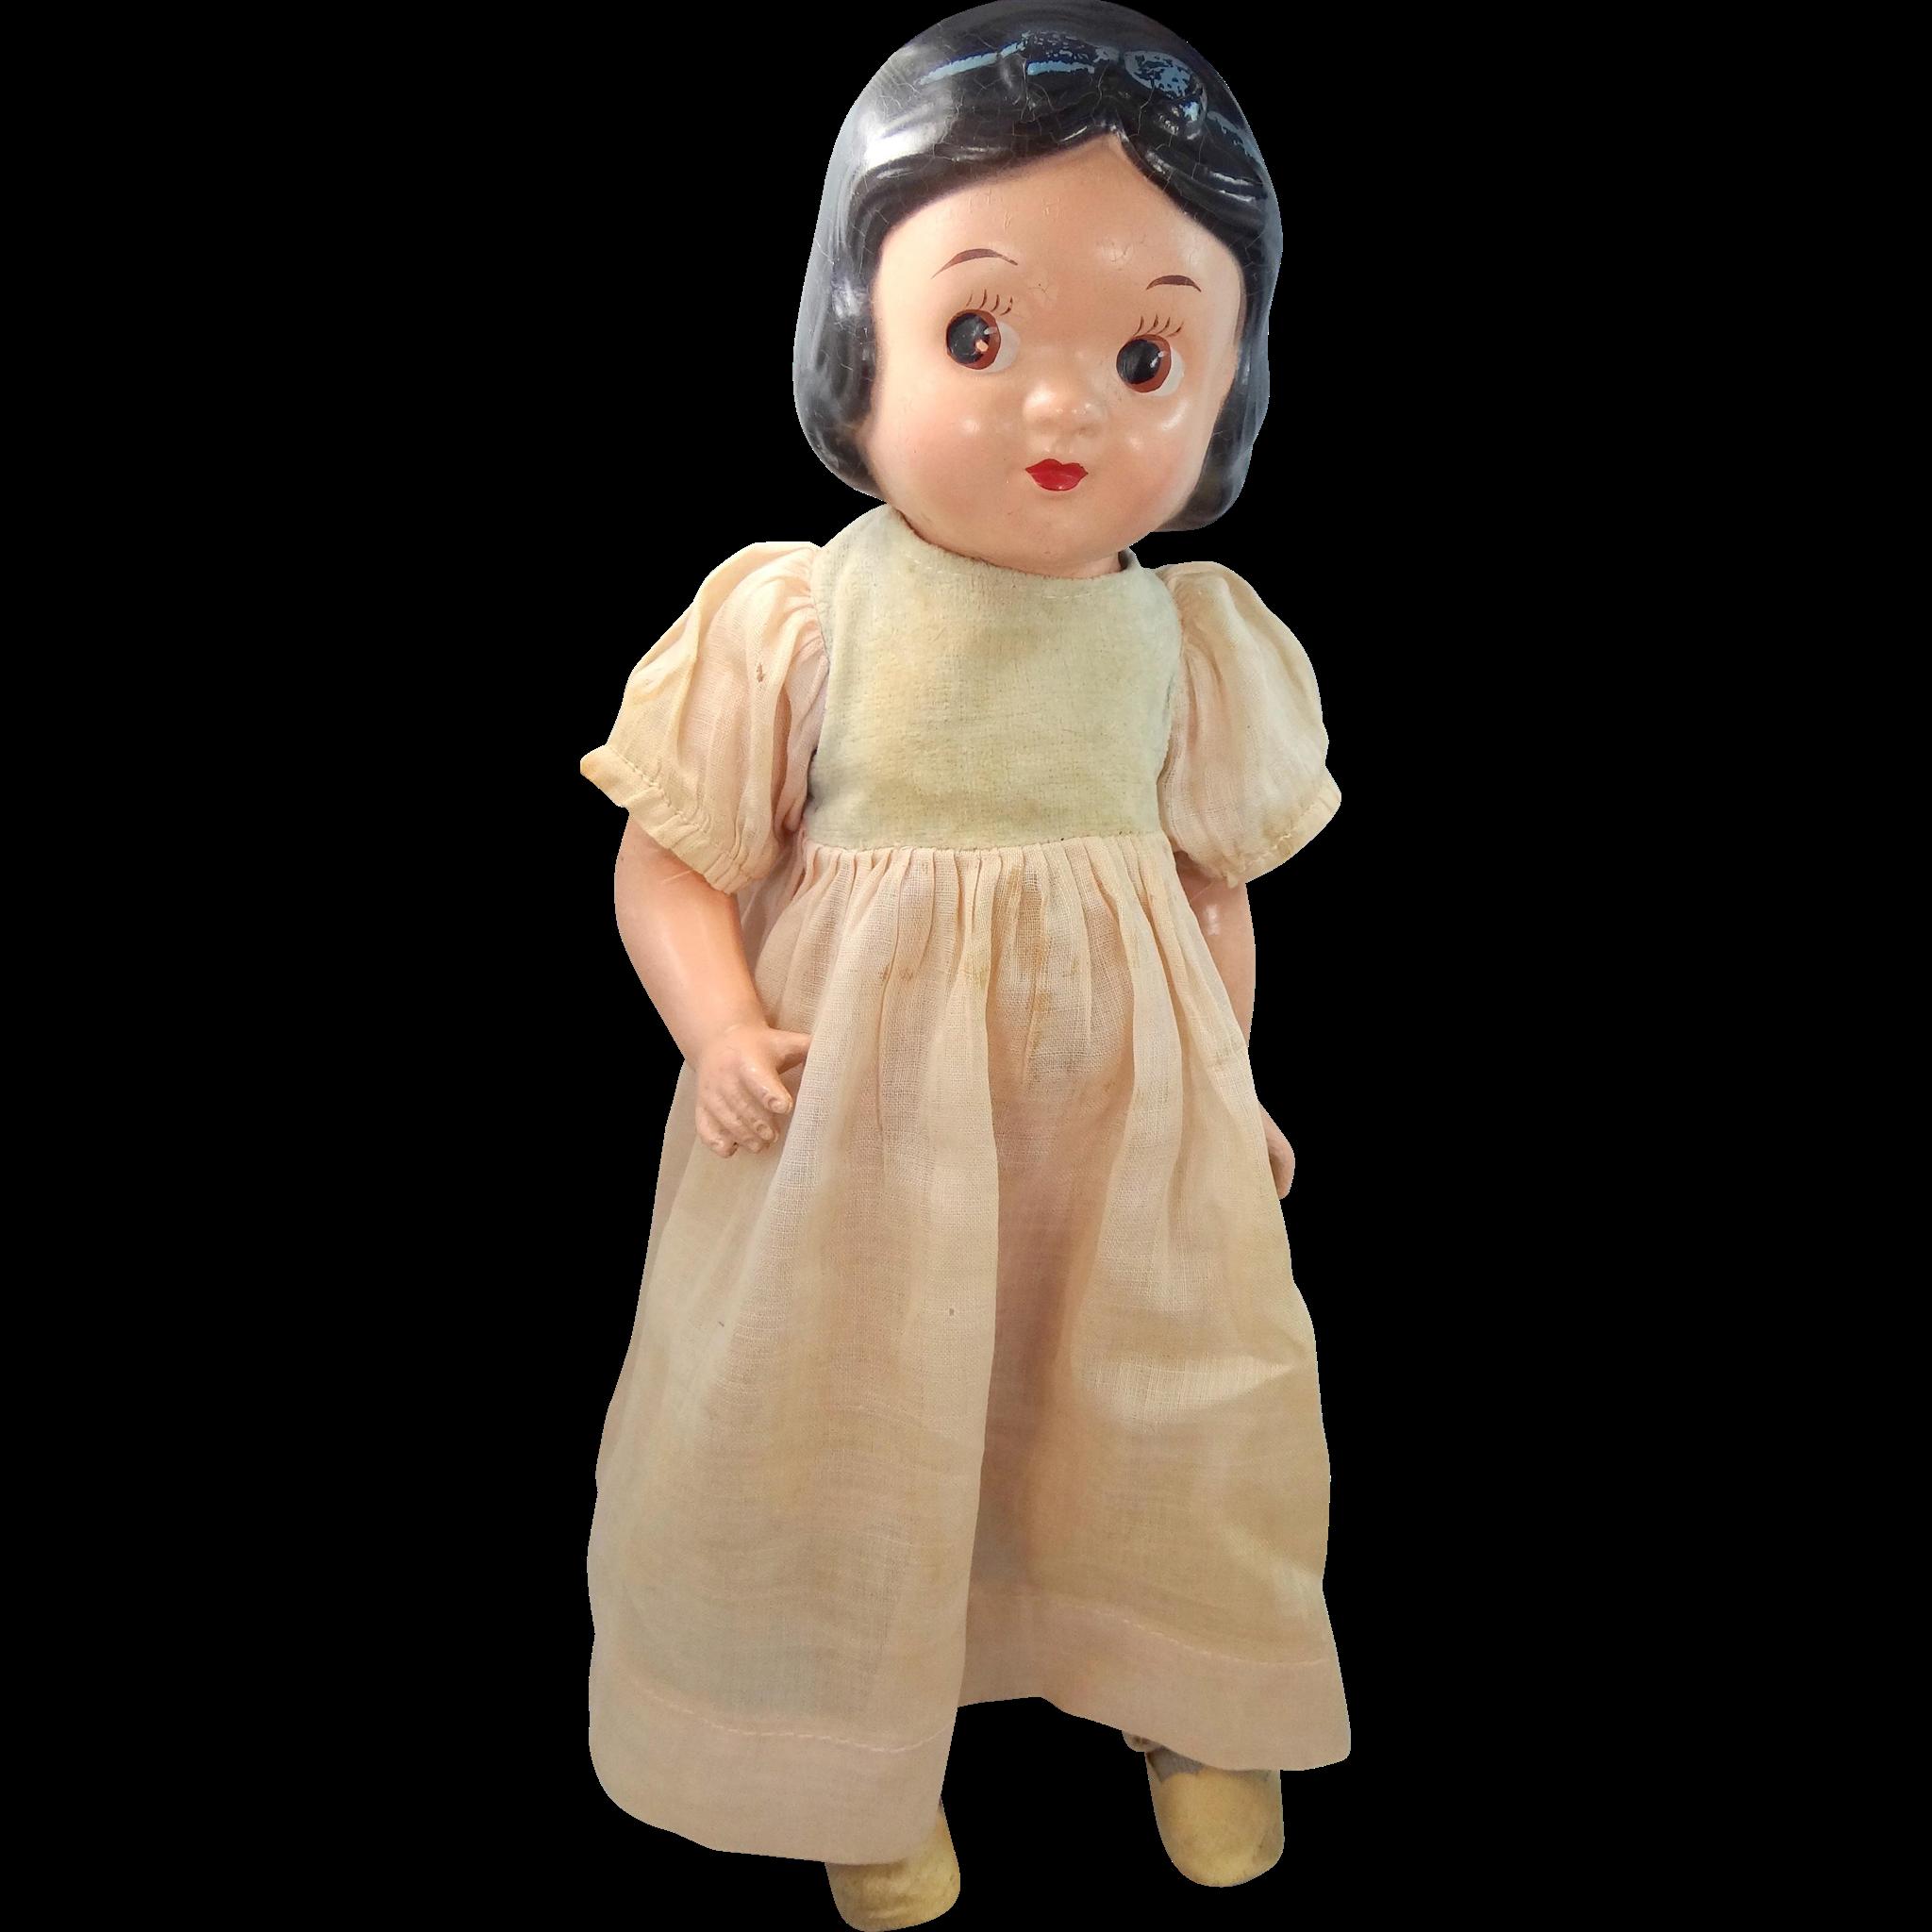 "12"" Knickerbocker Toy Snow White 1930's Composition Doll Walt Disney"